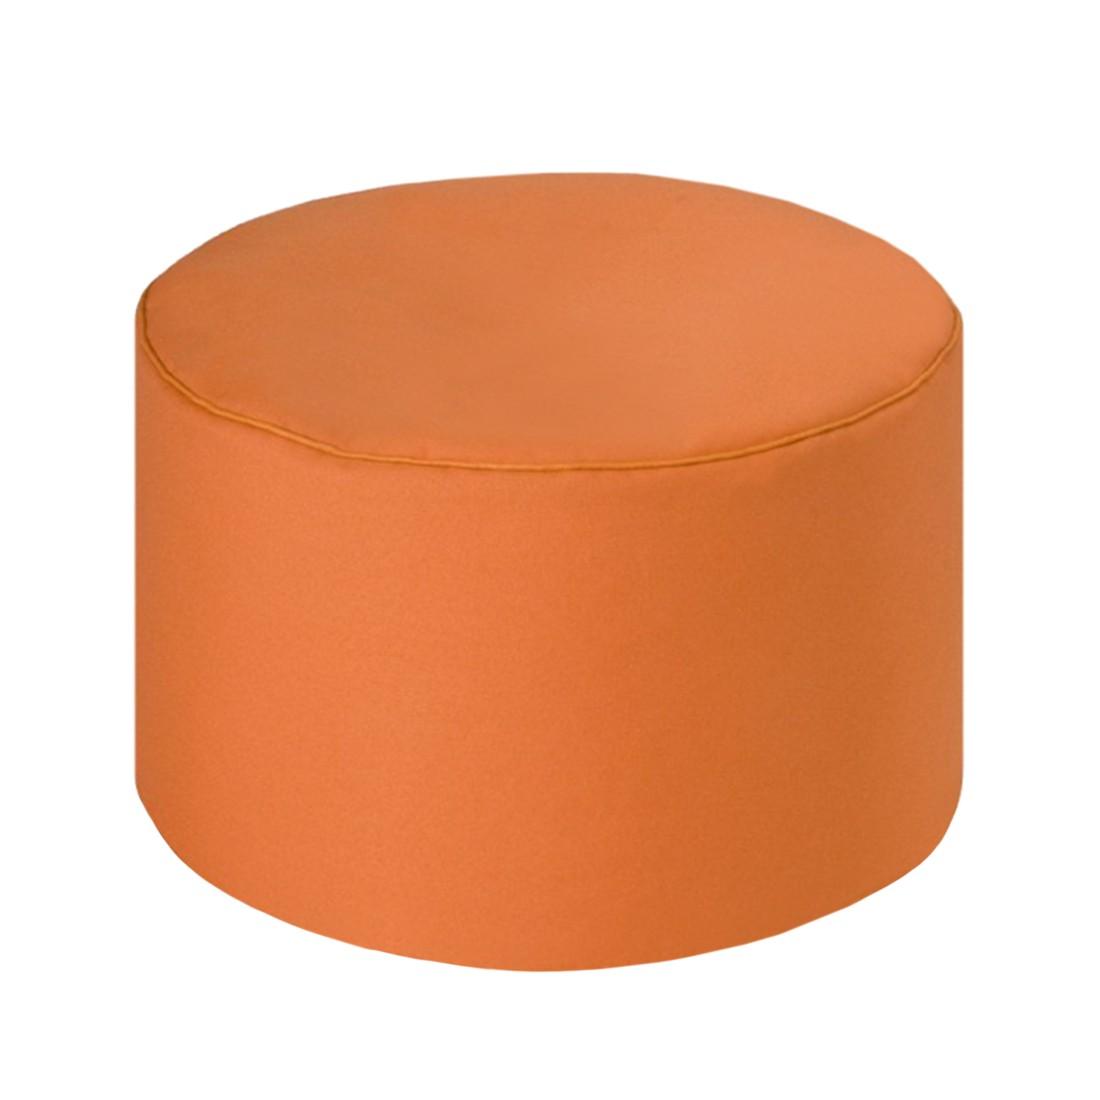 Fußhocker Scuba dot com - Orange, SITTING POINT